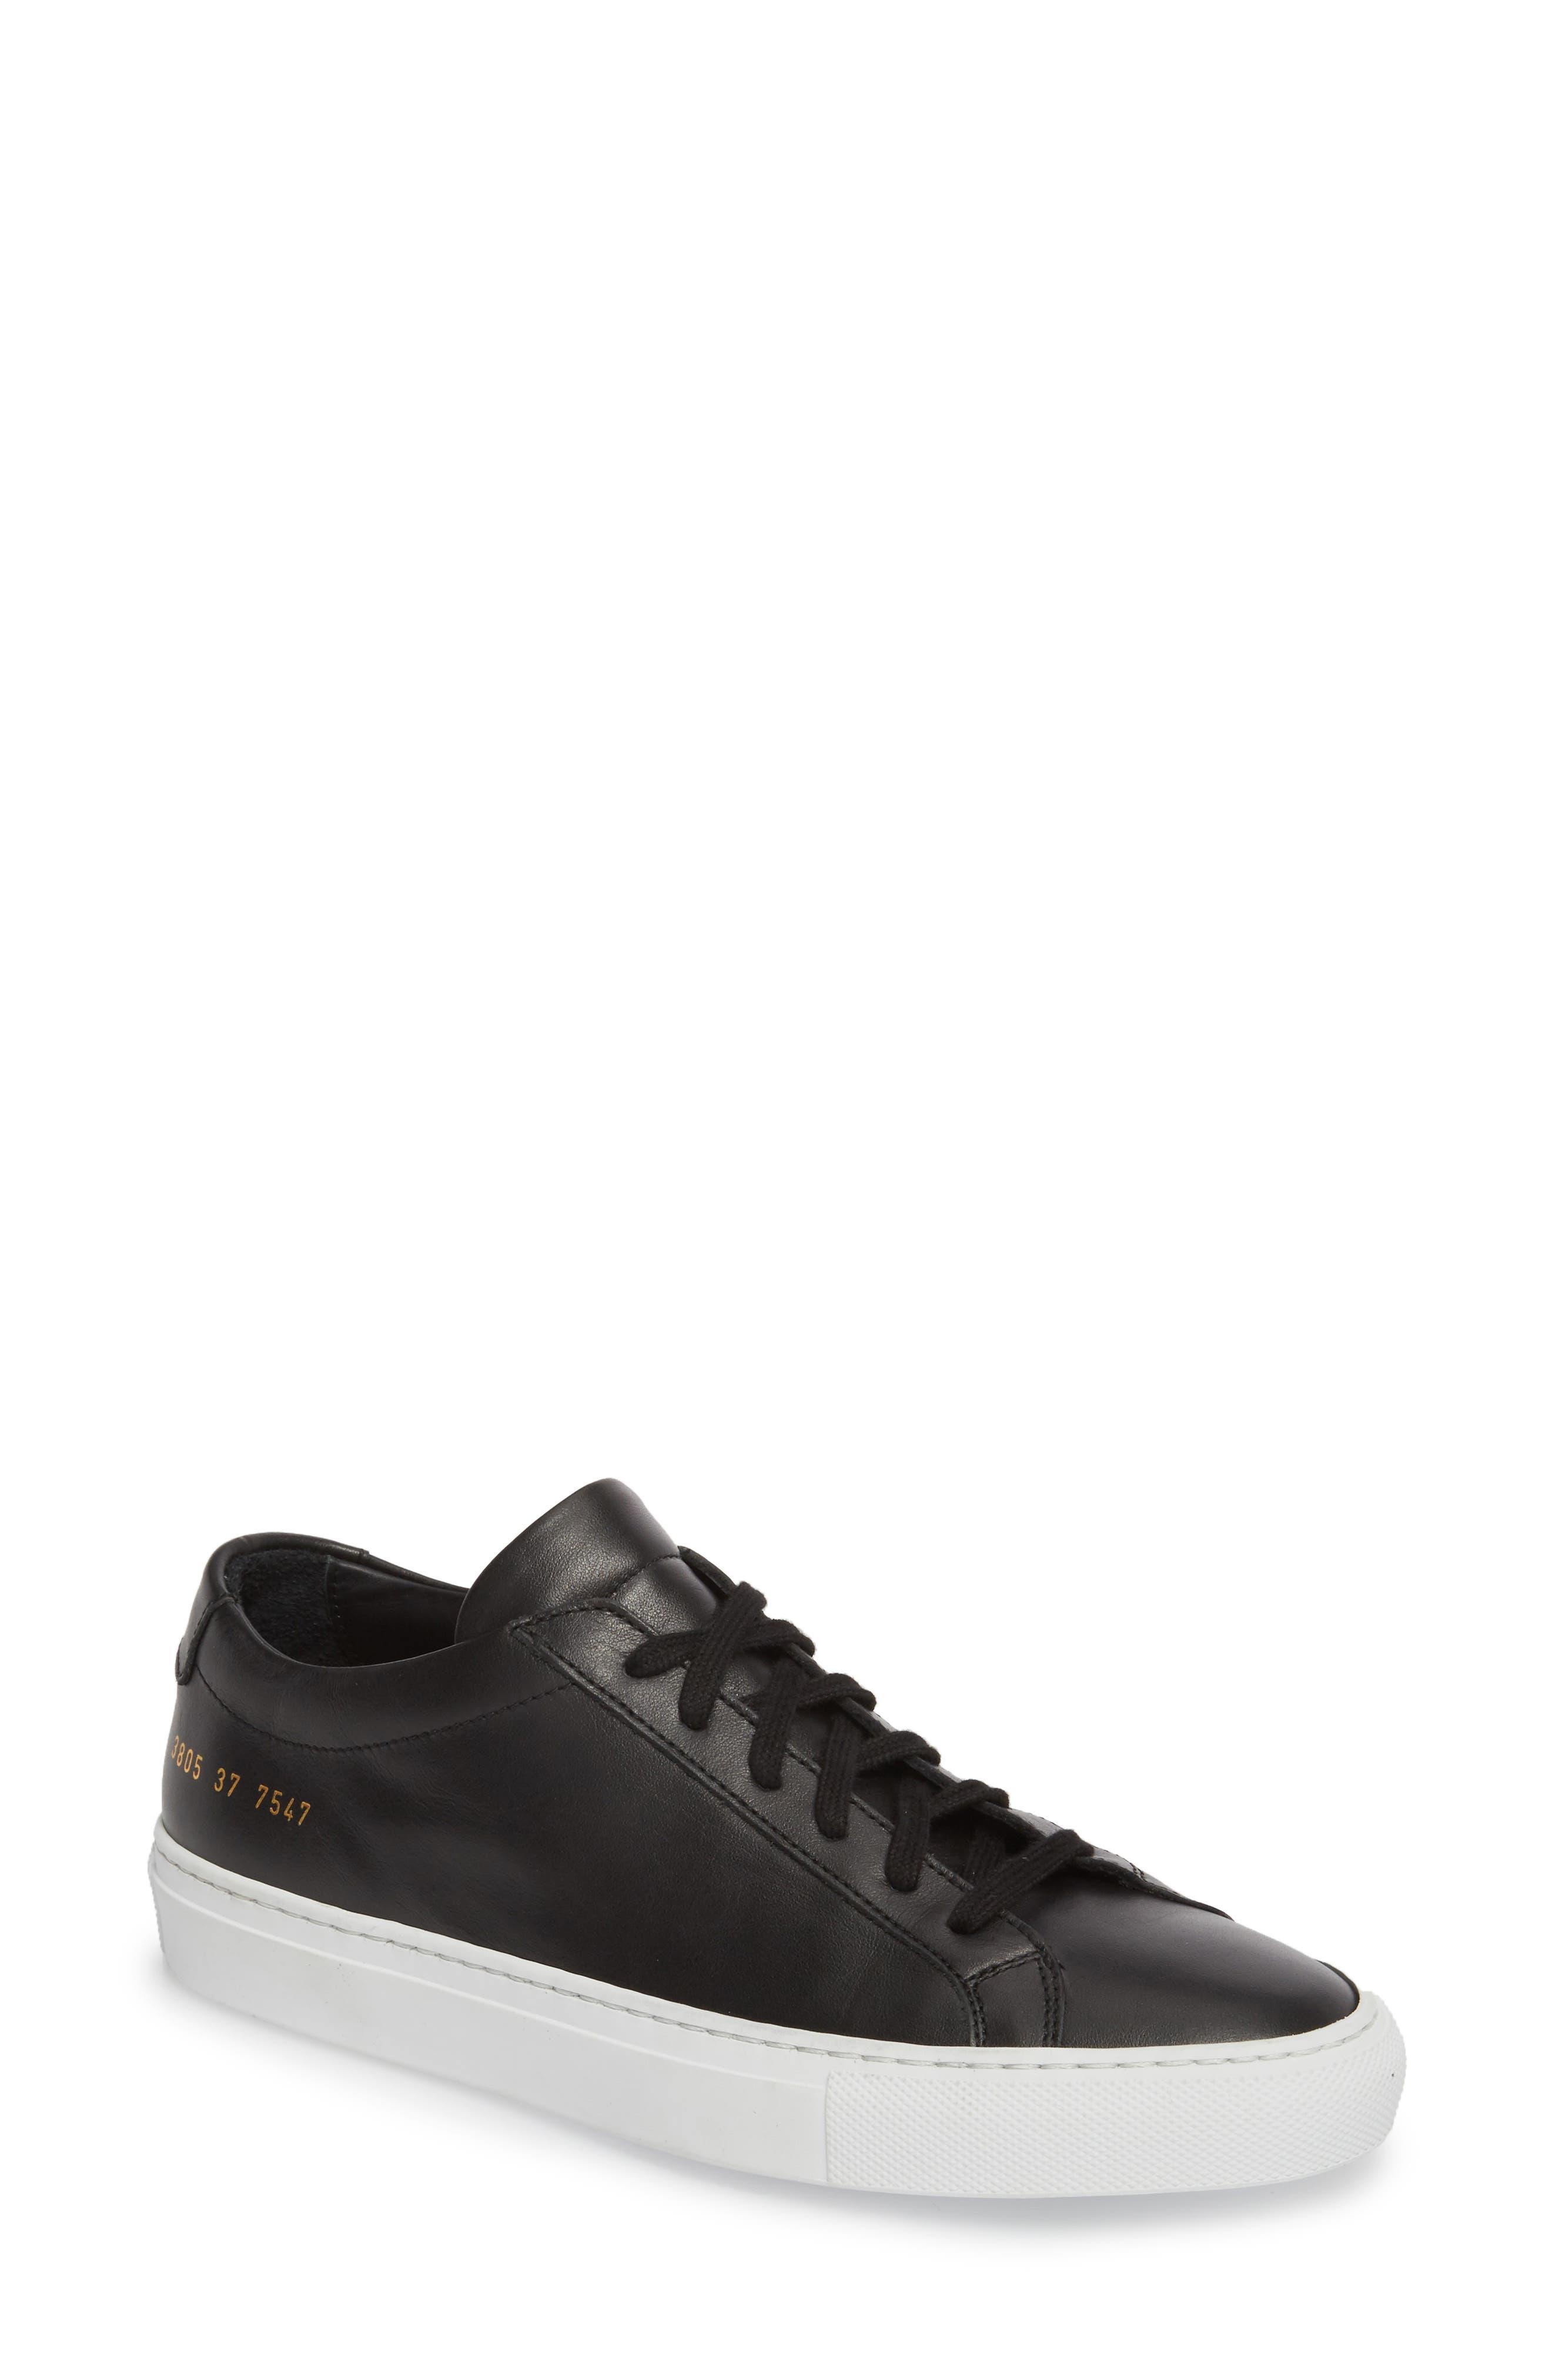 Original Achilles Low Sneaker,                         Main,                         color, Black